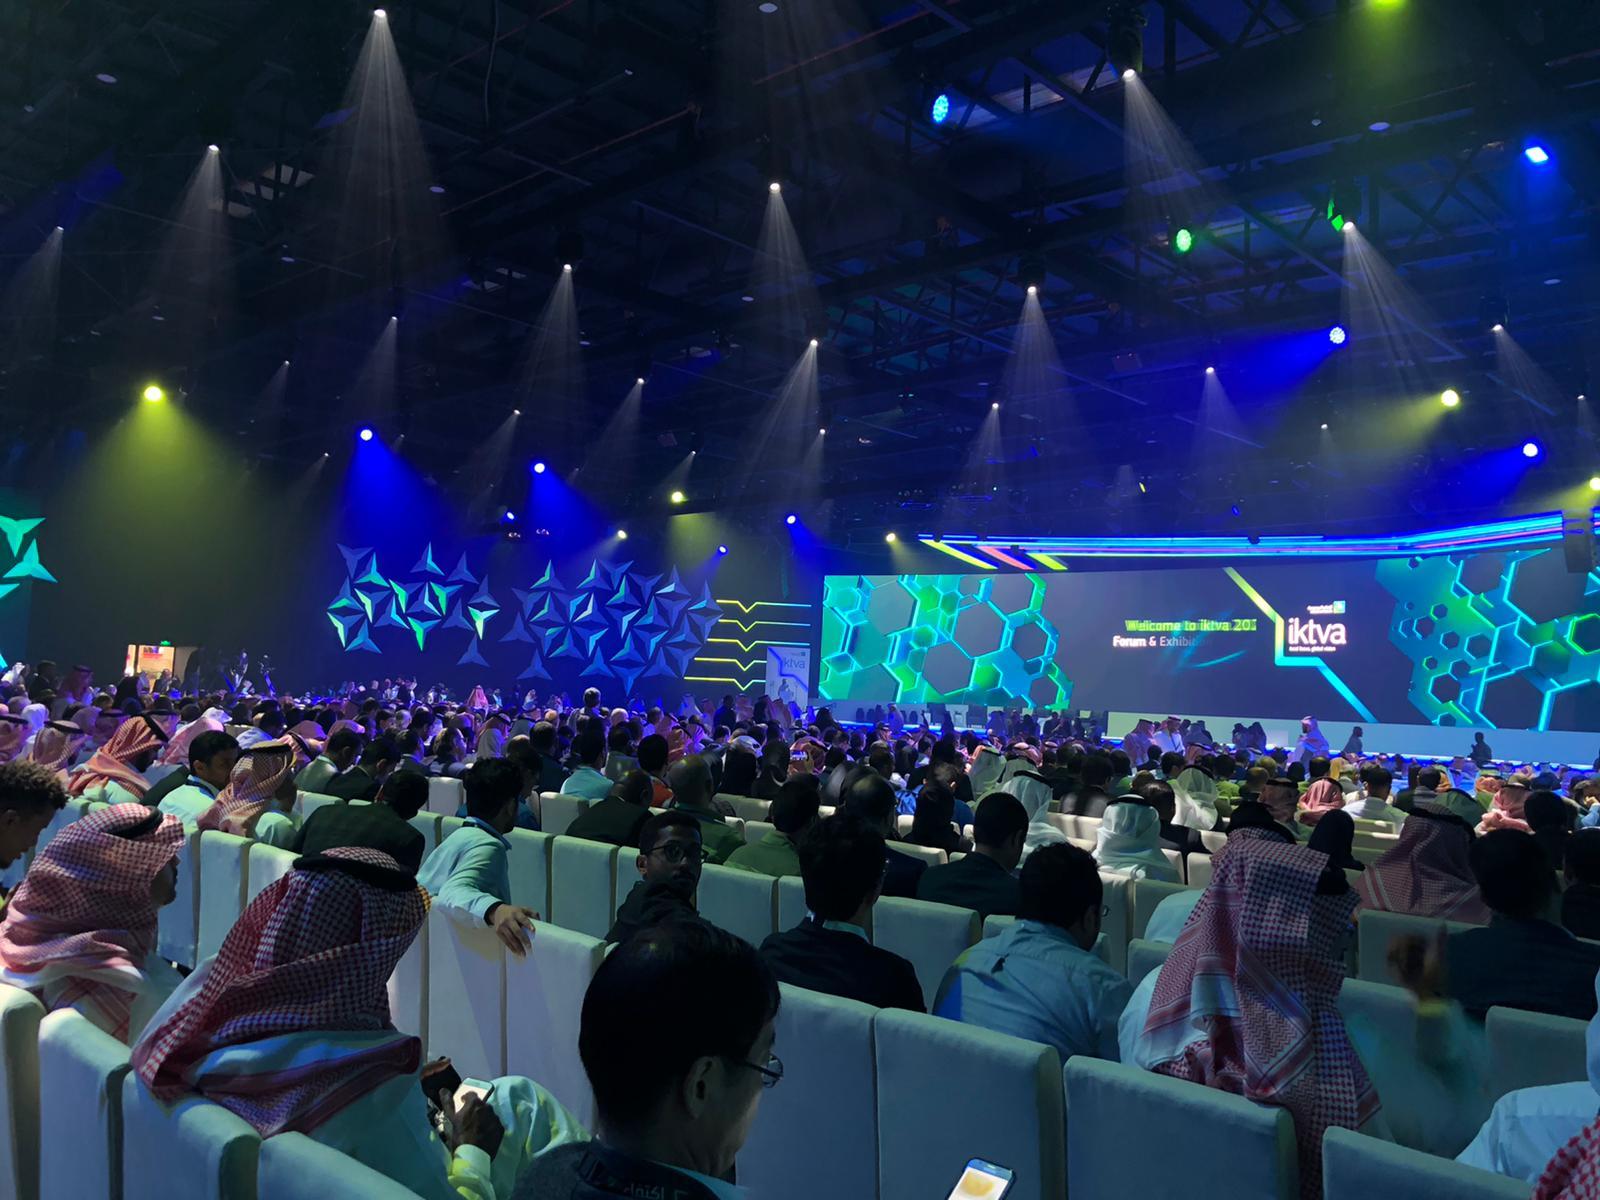 Company visit to Kingdom of Saudi Arabia and Kingdom of Bahrain, 23-26 February 2020